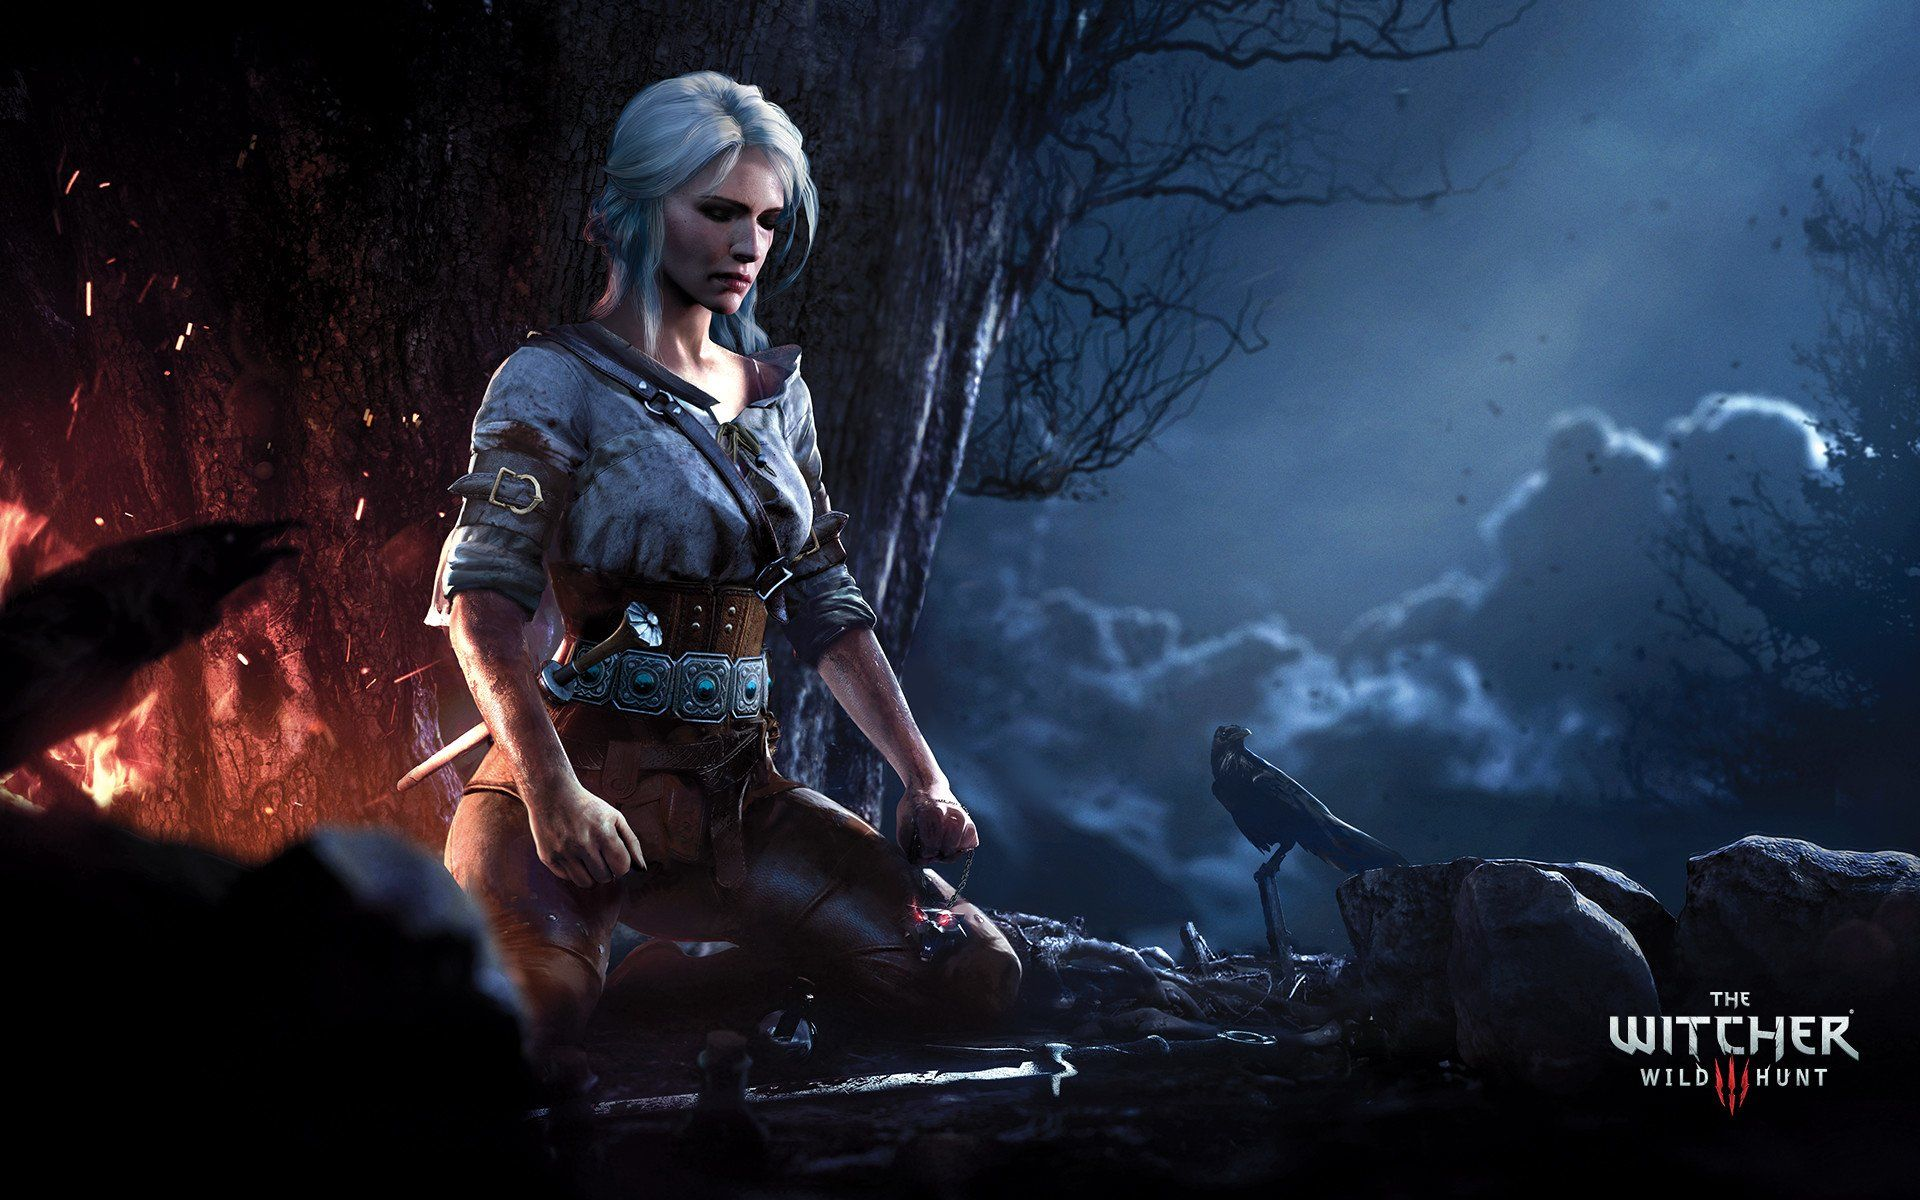 Witcher Ciri, Wallpaper Image